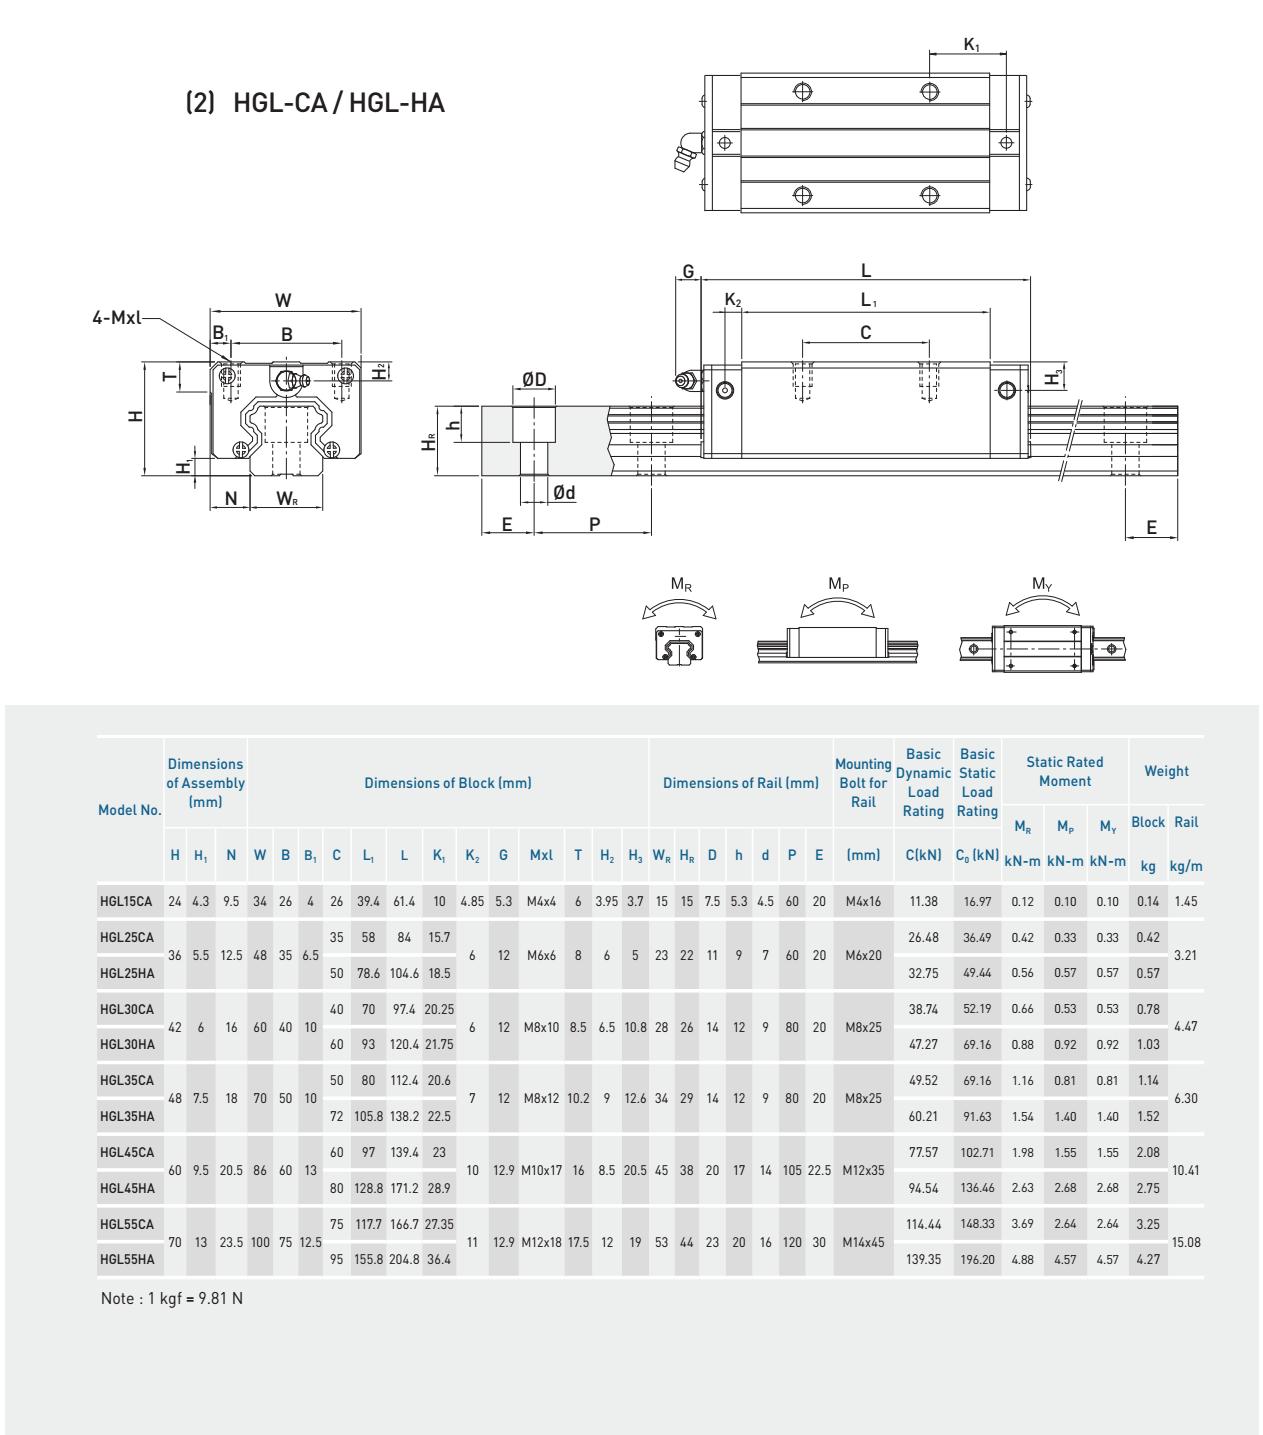 HIWIN linear guide HGL-CA HGL-HA catalog